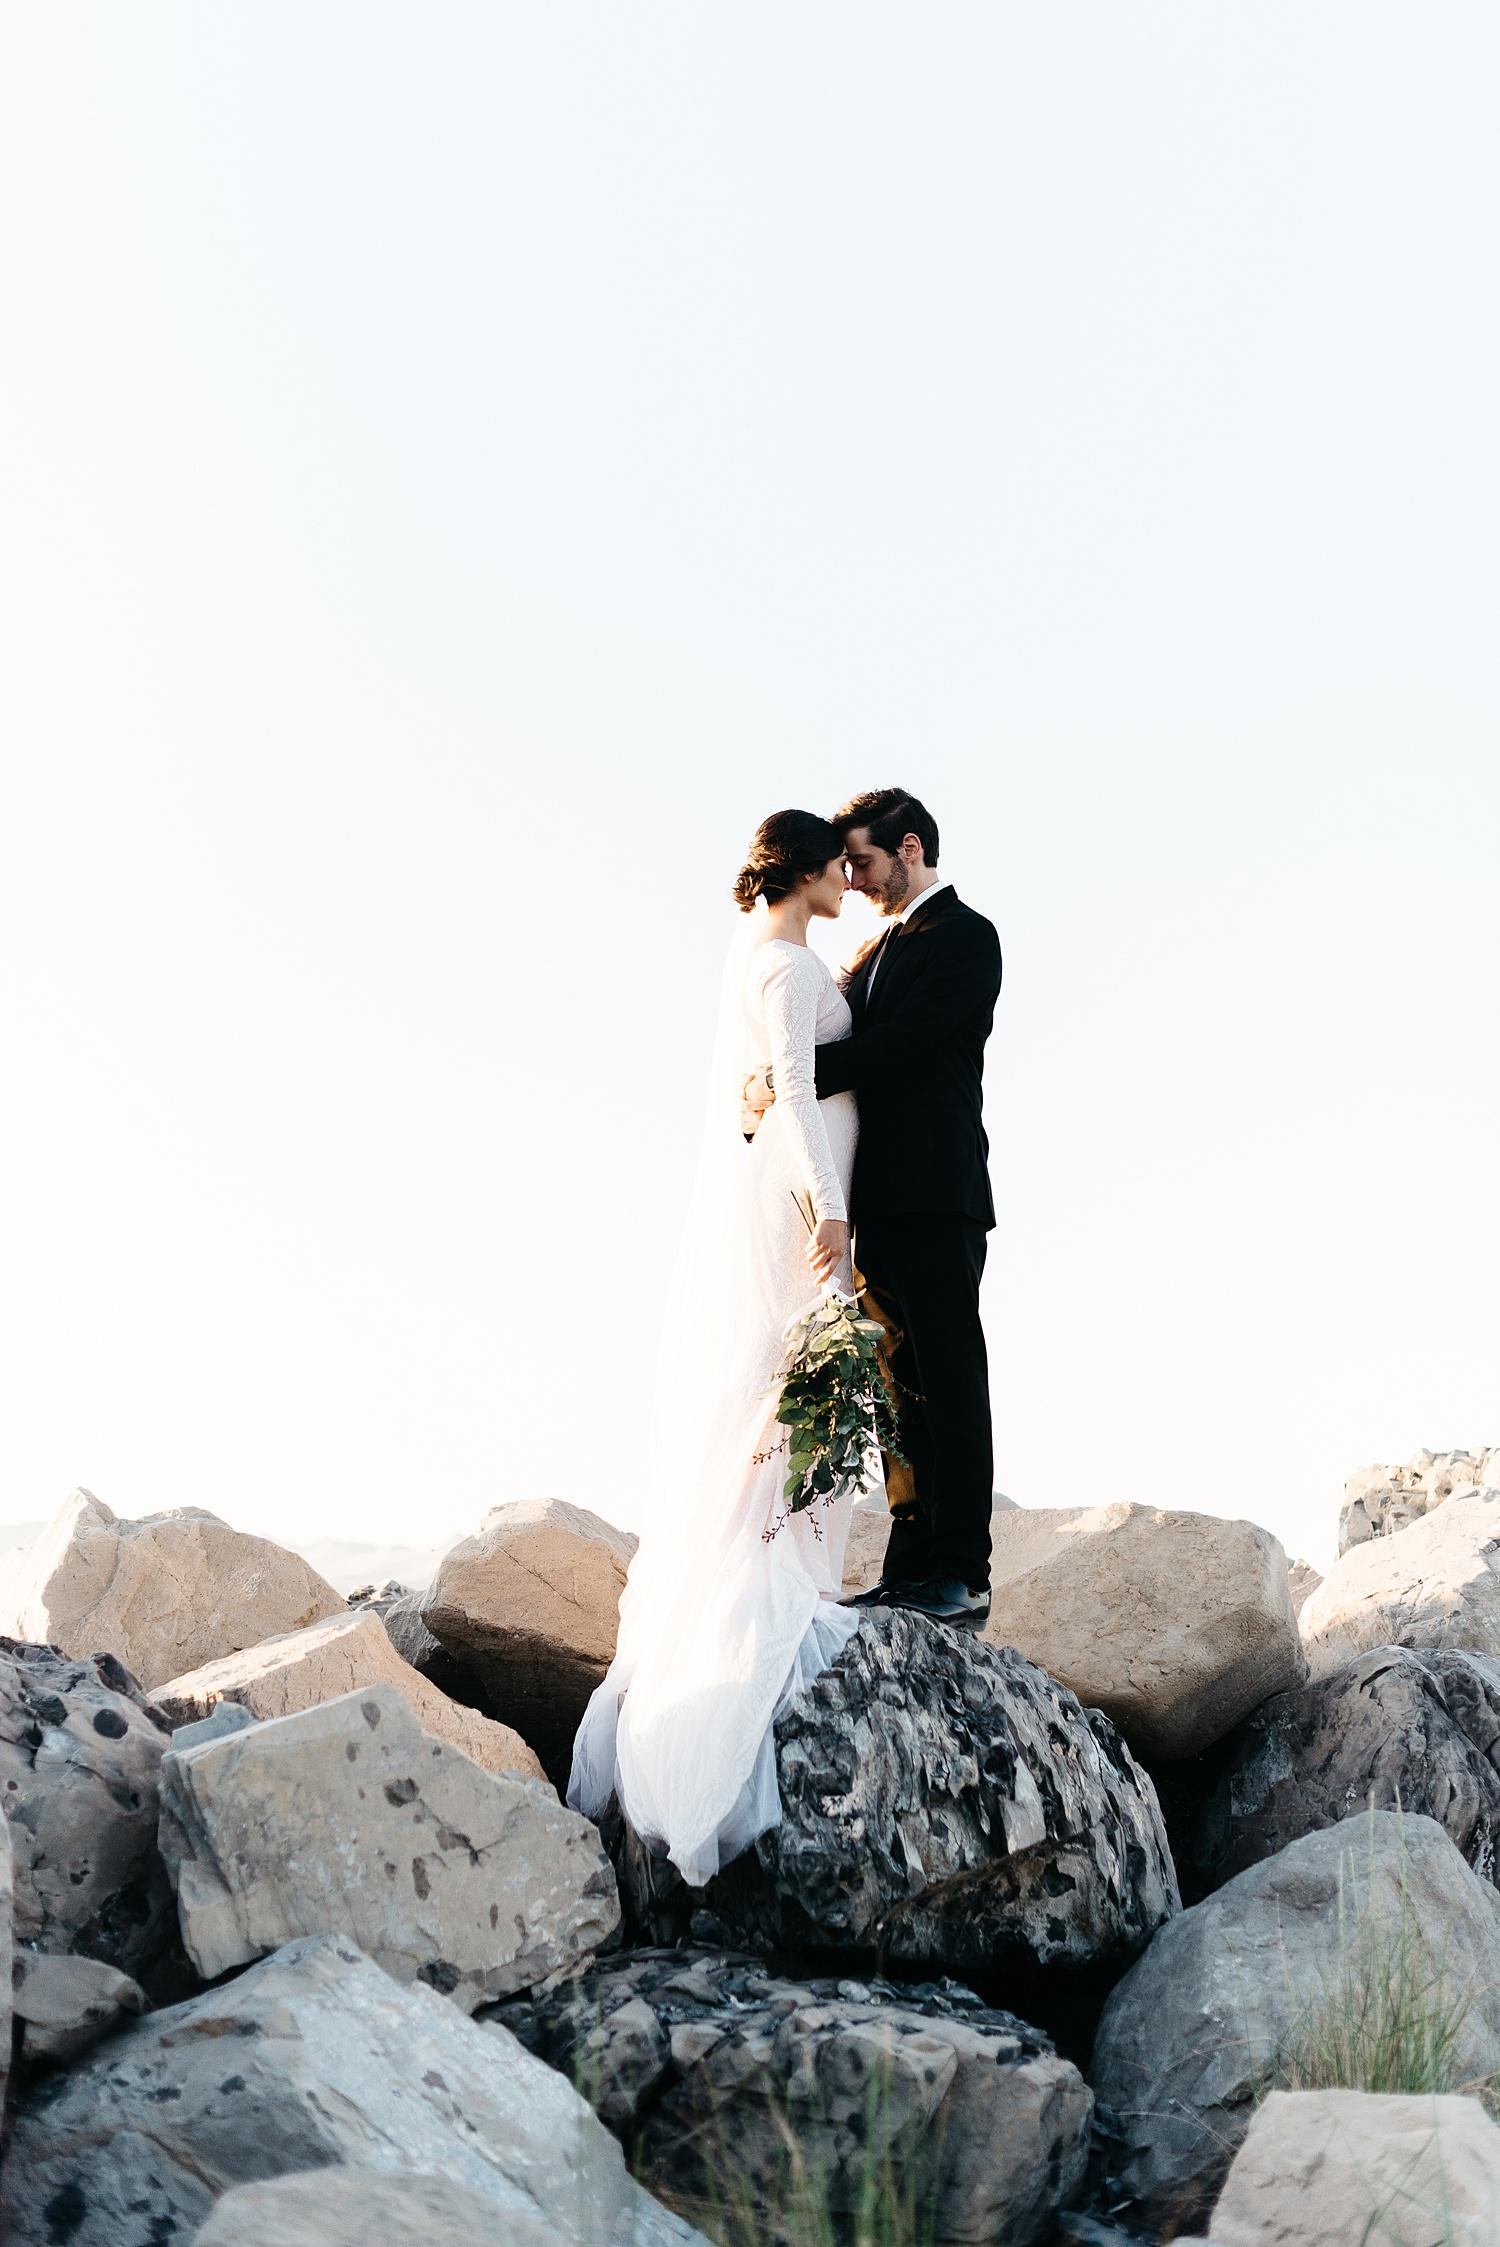 Zandra Barriga Photo - Cassie and Tristan Great Salt Lake Bridas_0009.jpg